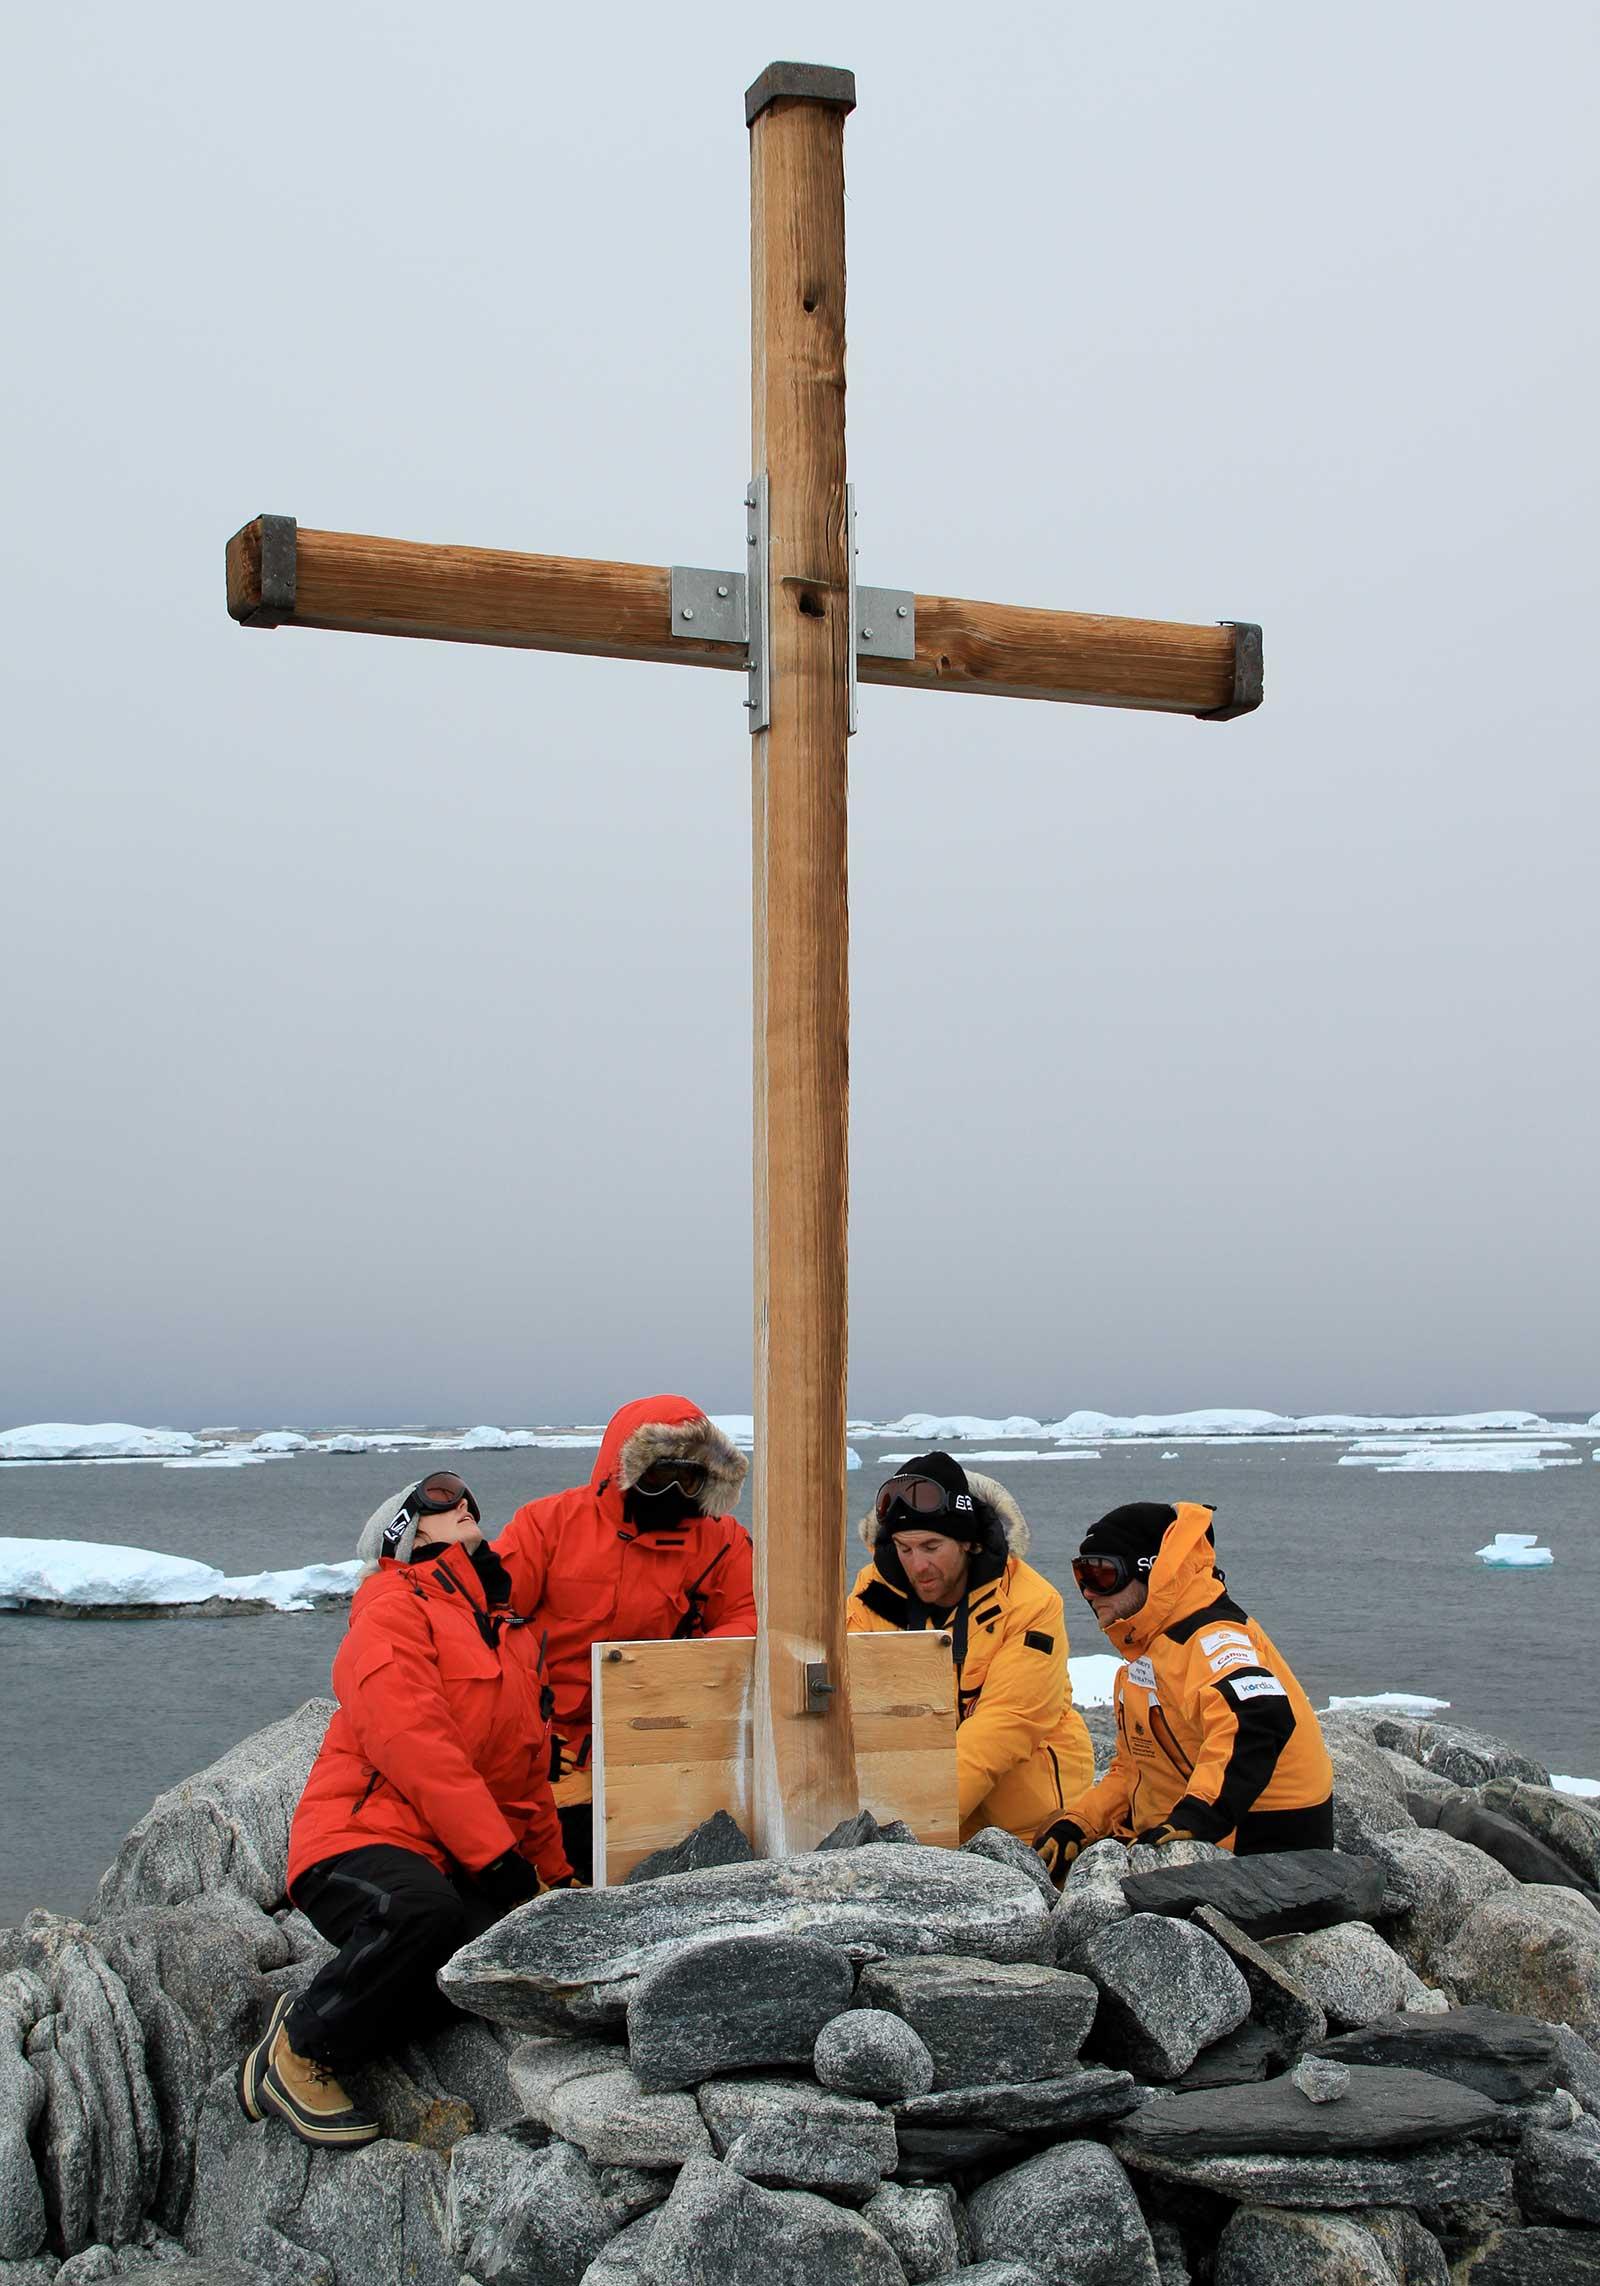 Mawson, Mawson's Huts, Mawson's Huts Foundation, Cape Denison, East Antarctica, Antarctica, Australasian Antarctic Expedition, AAE, Australia's Antarctic Heritage, Antarctic History, Heroic Era of Antarctica,